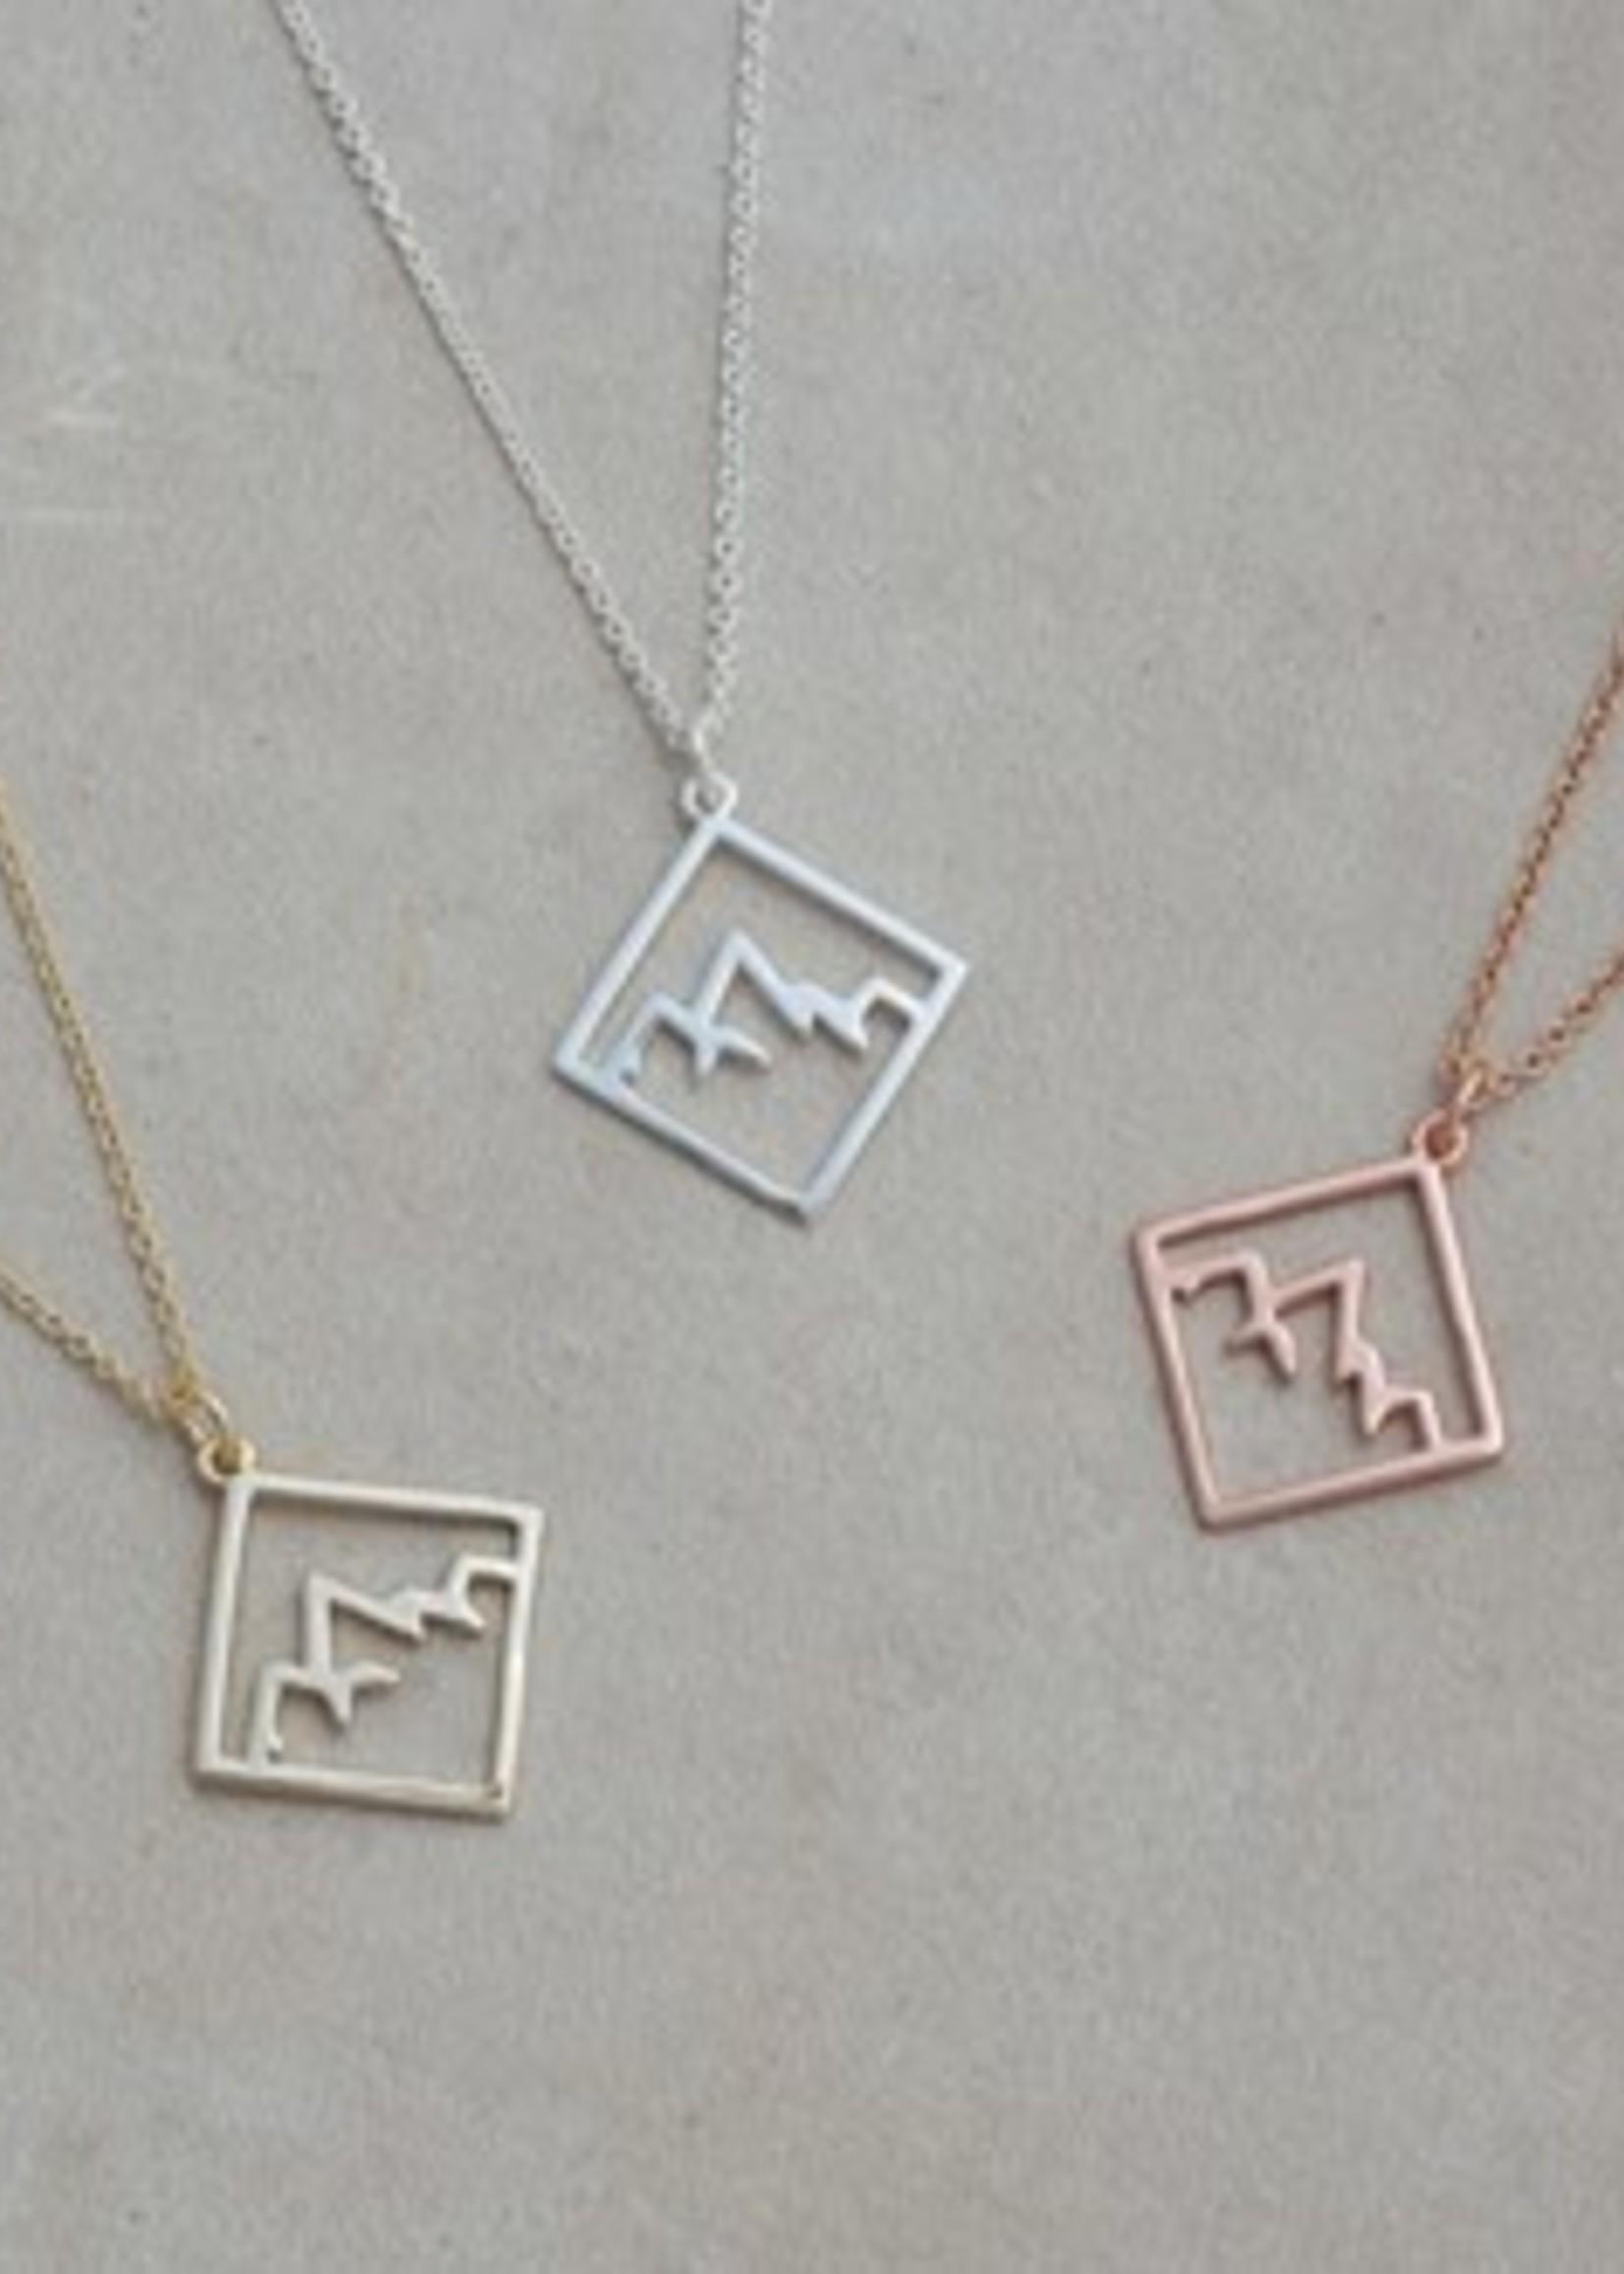 Glee Jewelry Ridge Necklace Gold